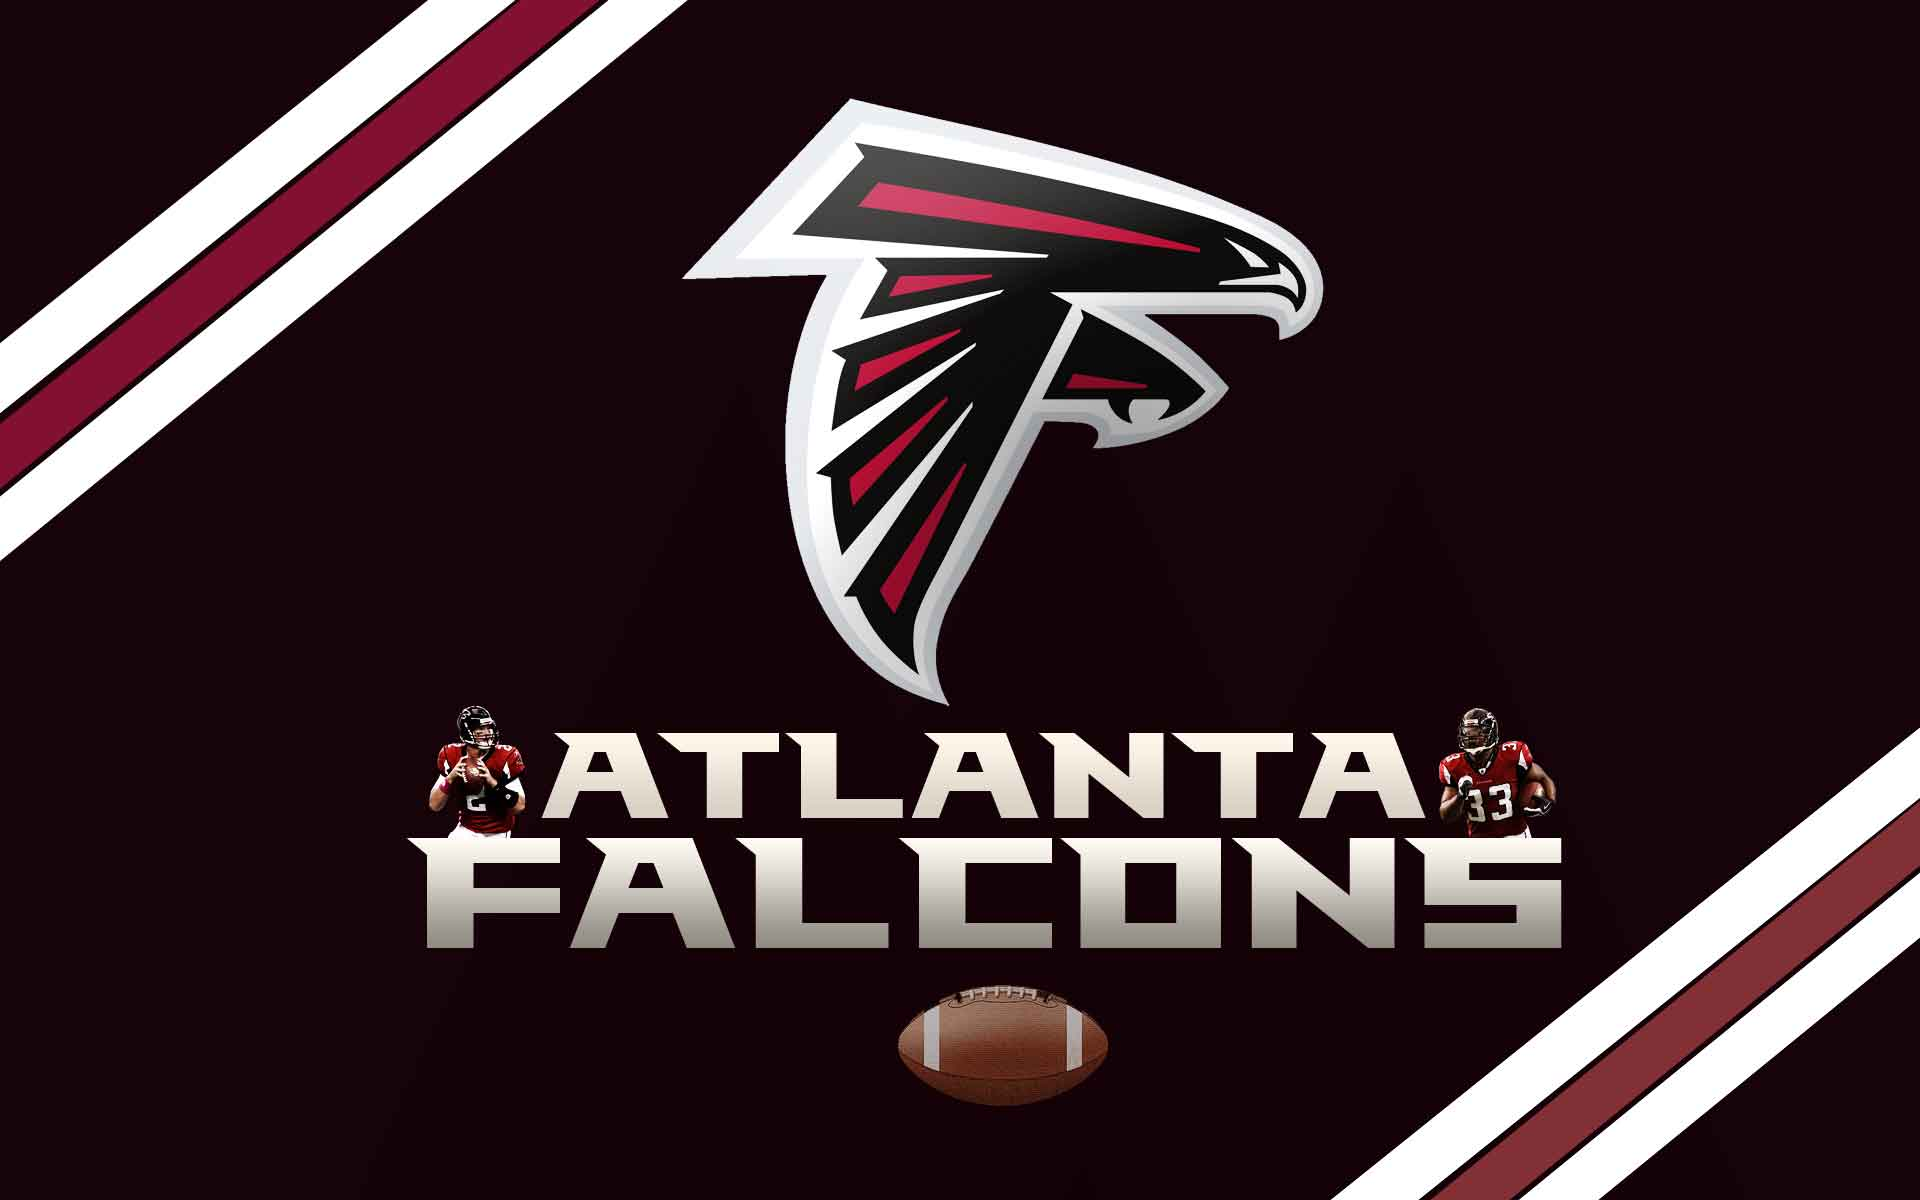 Atlanta Falcons Logos